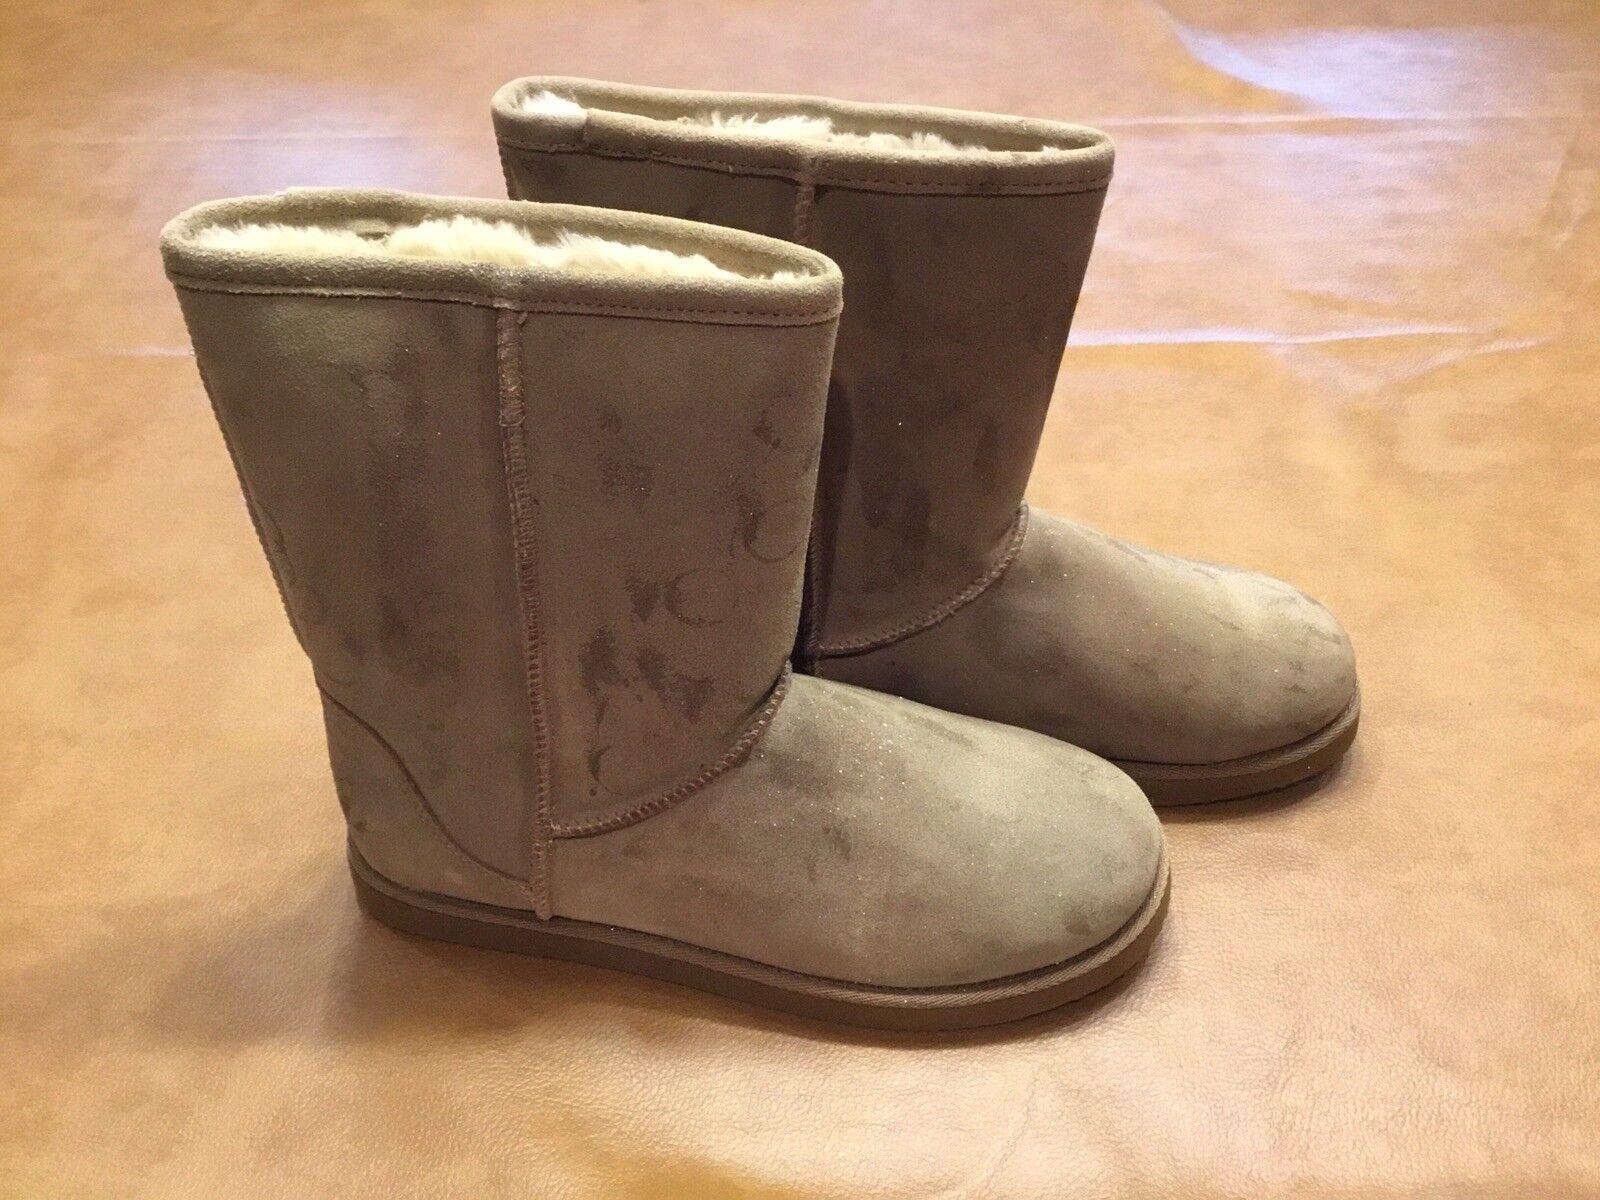 Melrose Avenue Damenschuhe Stiefel Größe 11 Tan Suede Leder Furry flat Lining flat Furry 7df2ab